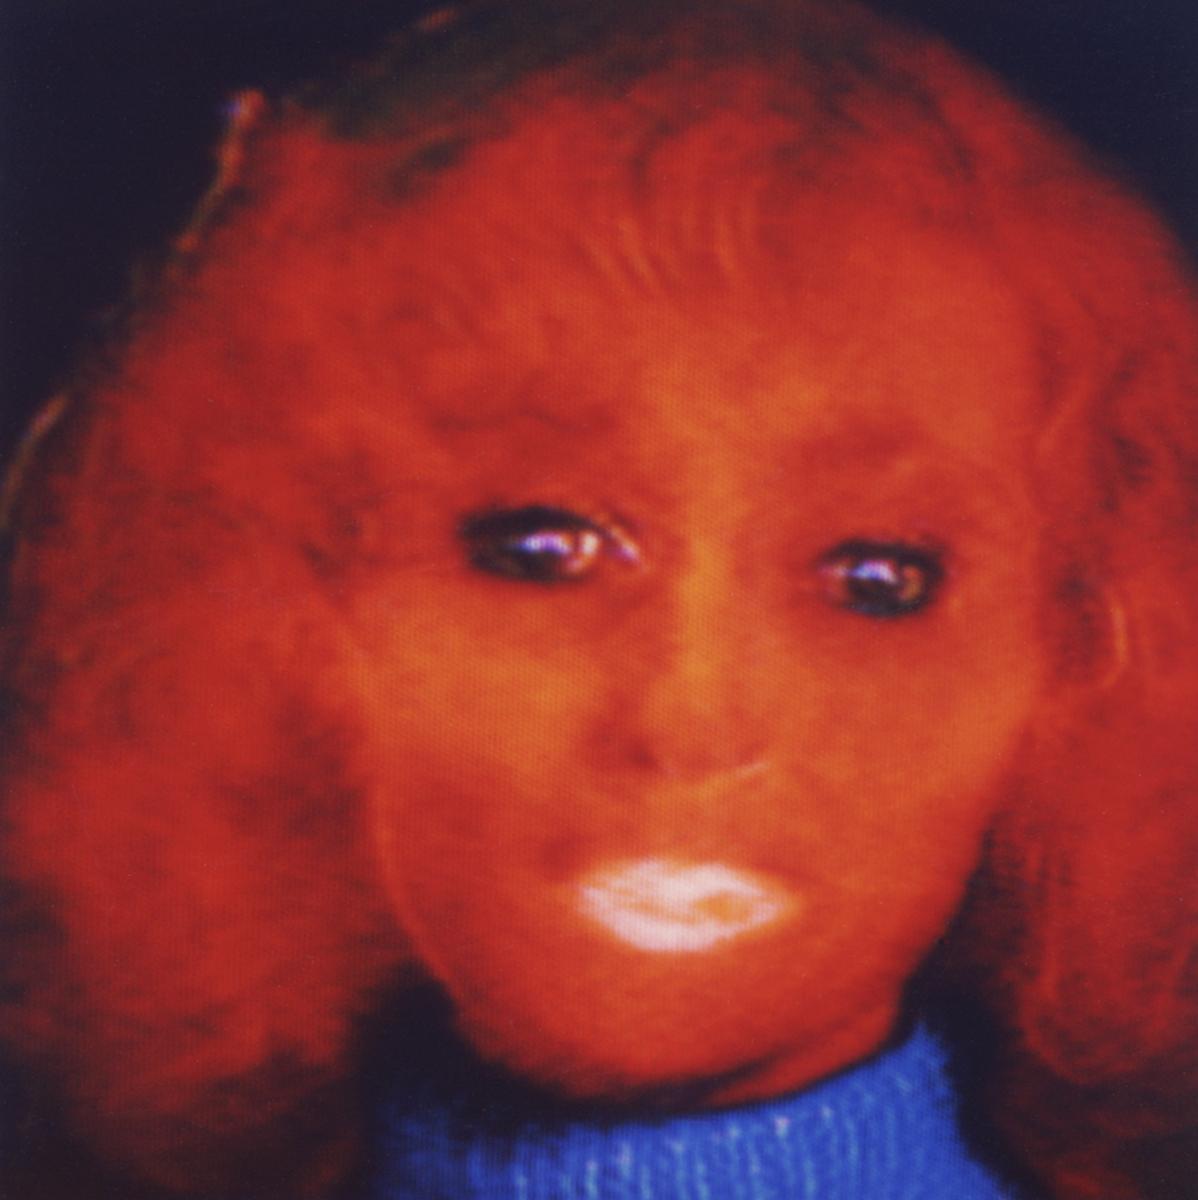 Television-TV-Polaroid-SX70-Woman-Surreal.jpg